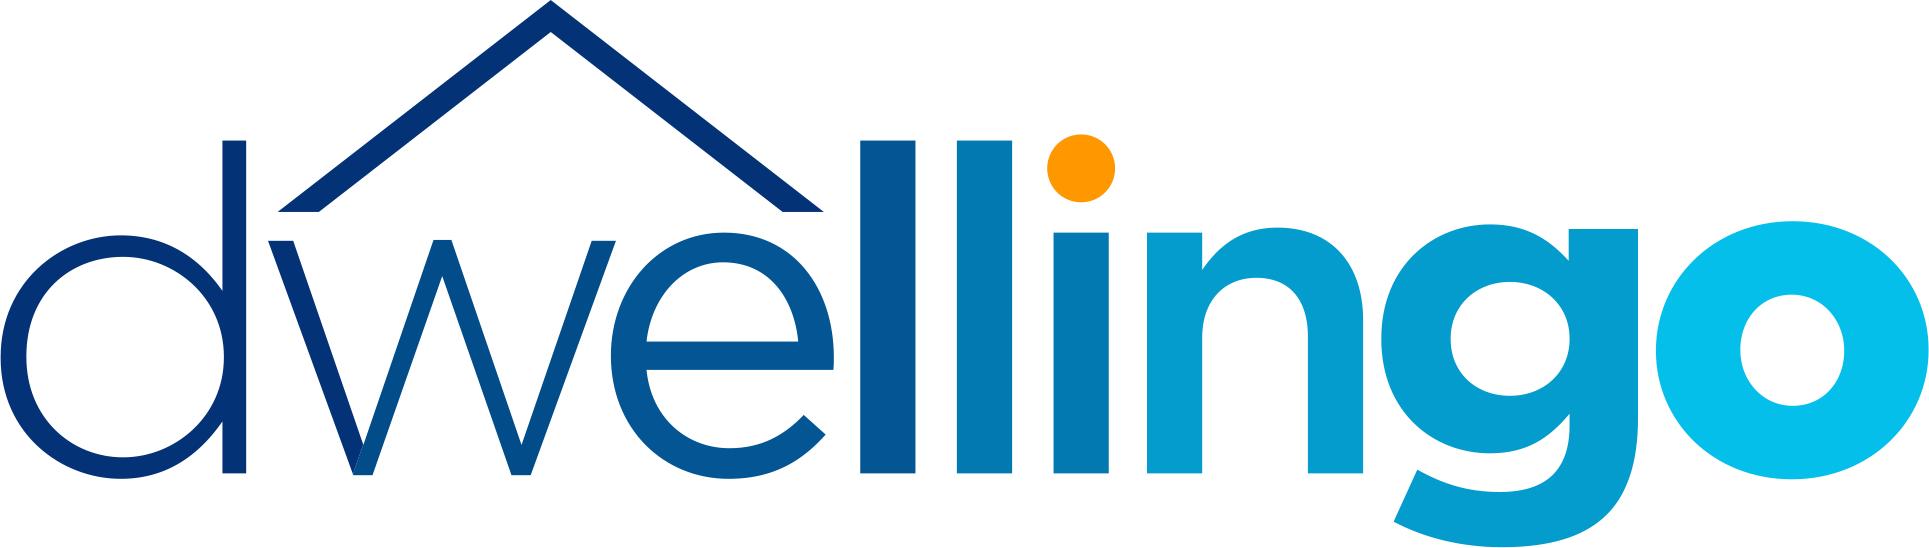 dwellingo Logo